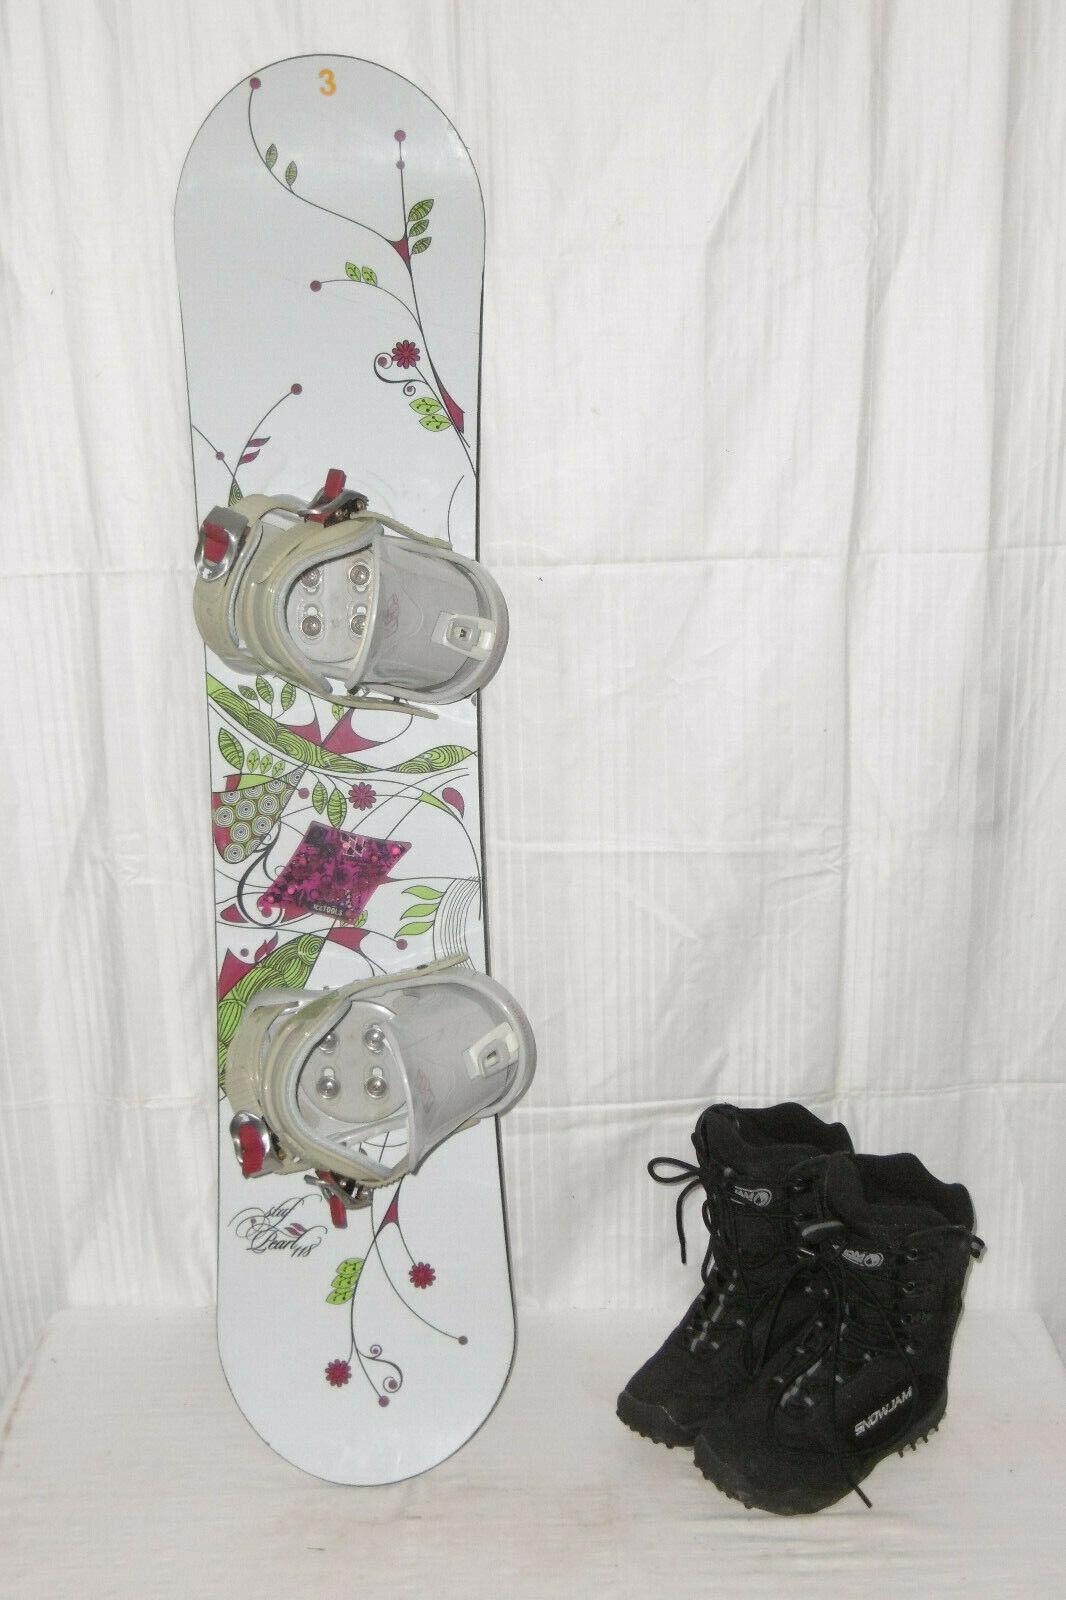 STUF   PEARL   TOP JUNIOR SNOWBOARD 118 CM + SNOWJAM Stiefel GR. 36 IM SET